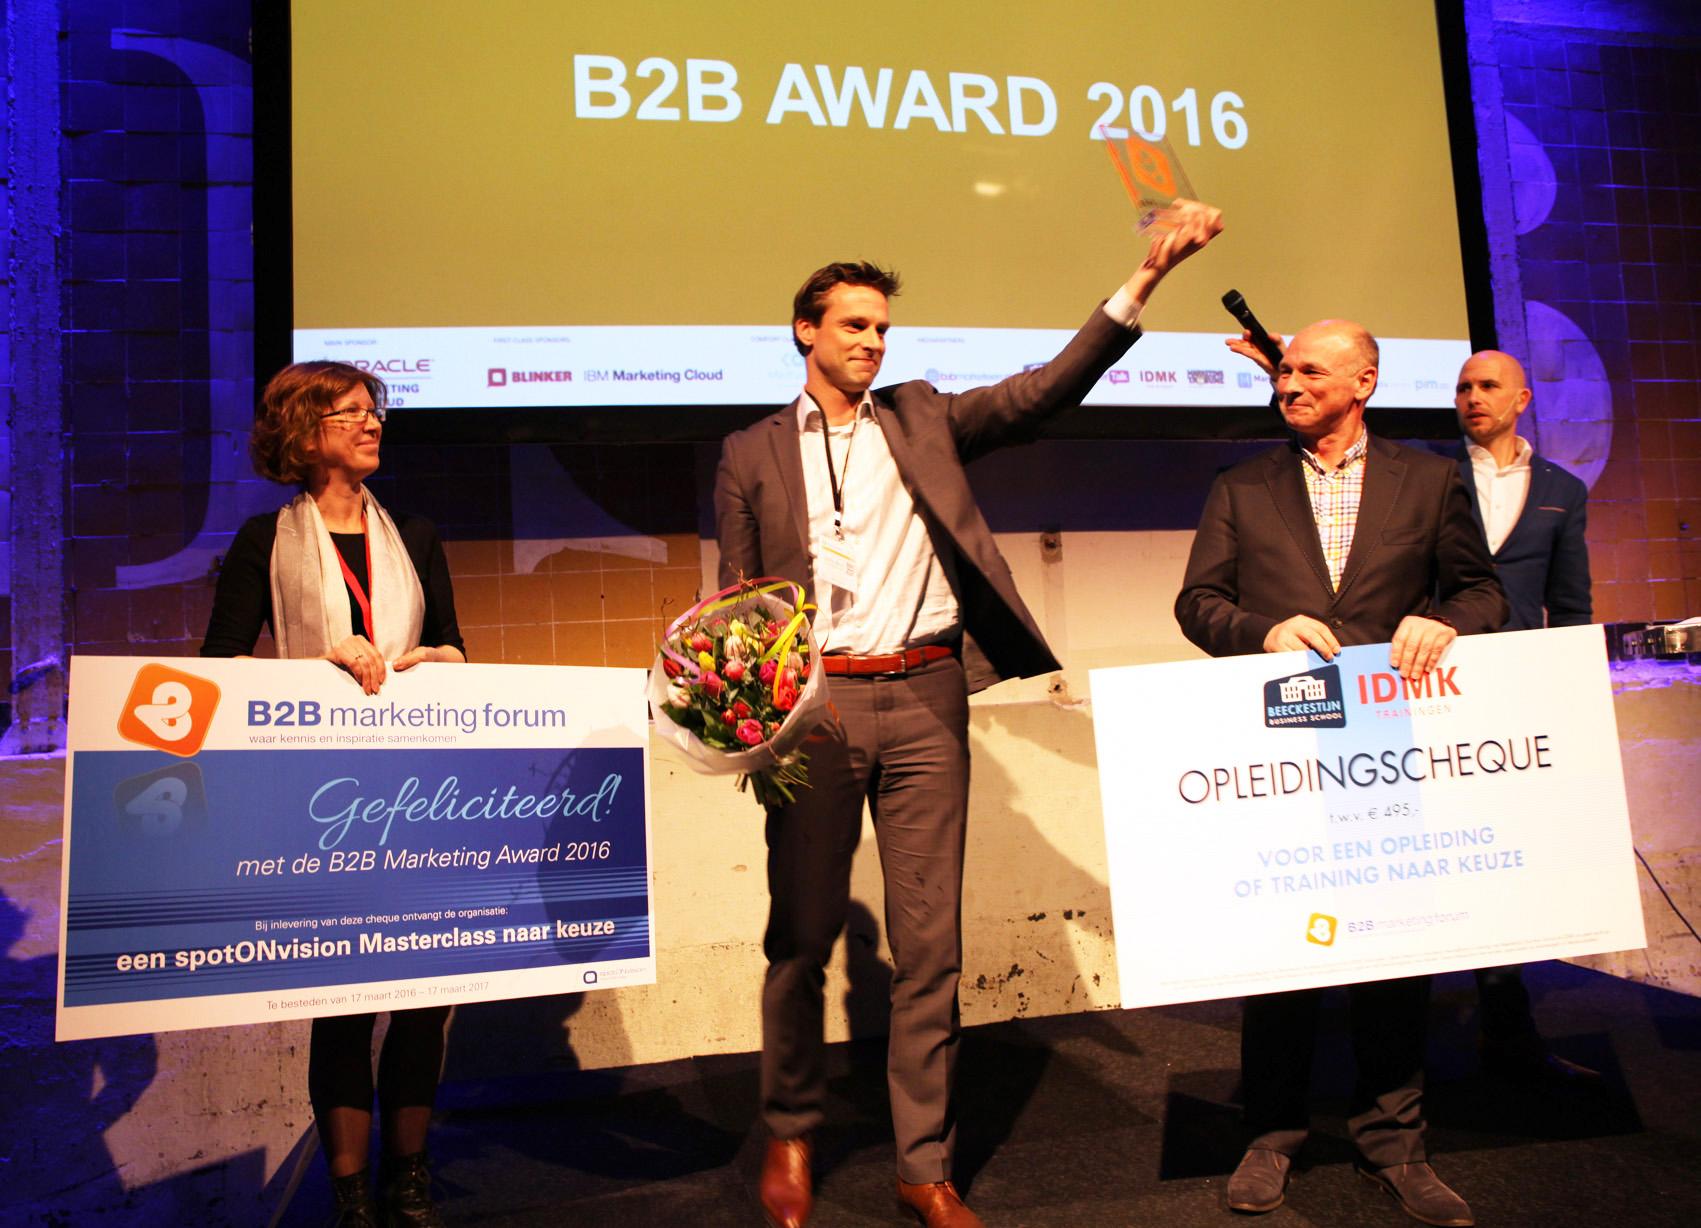 b2b marketing award 2016 winnaar